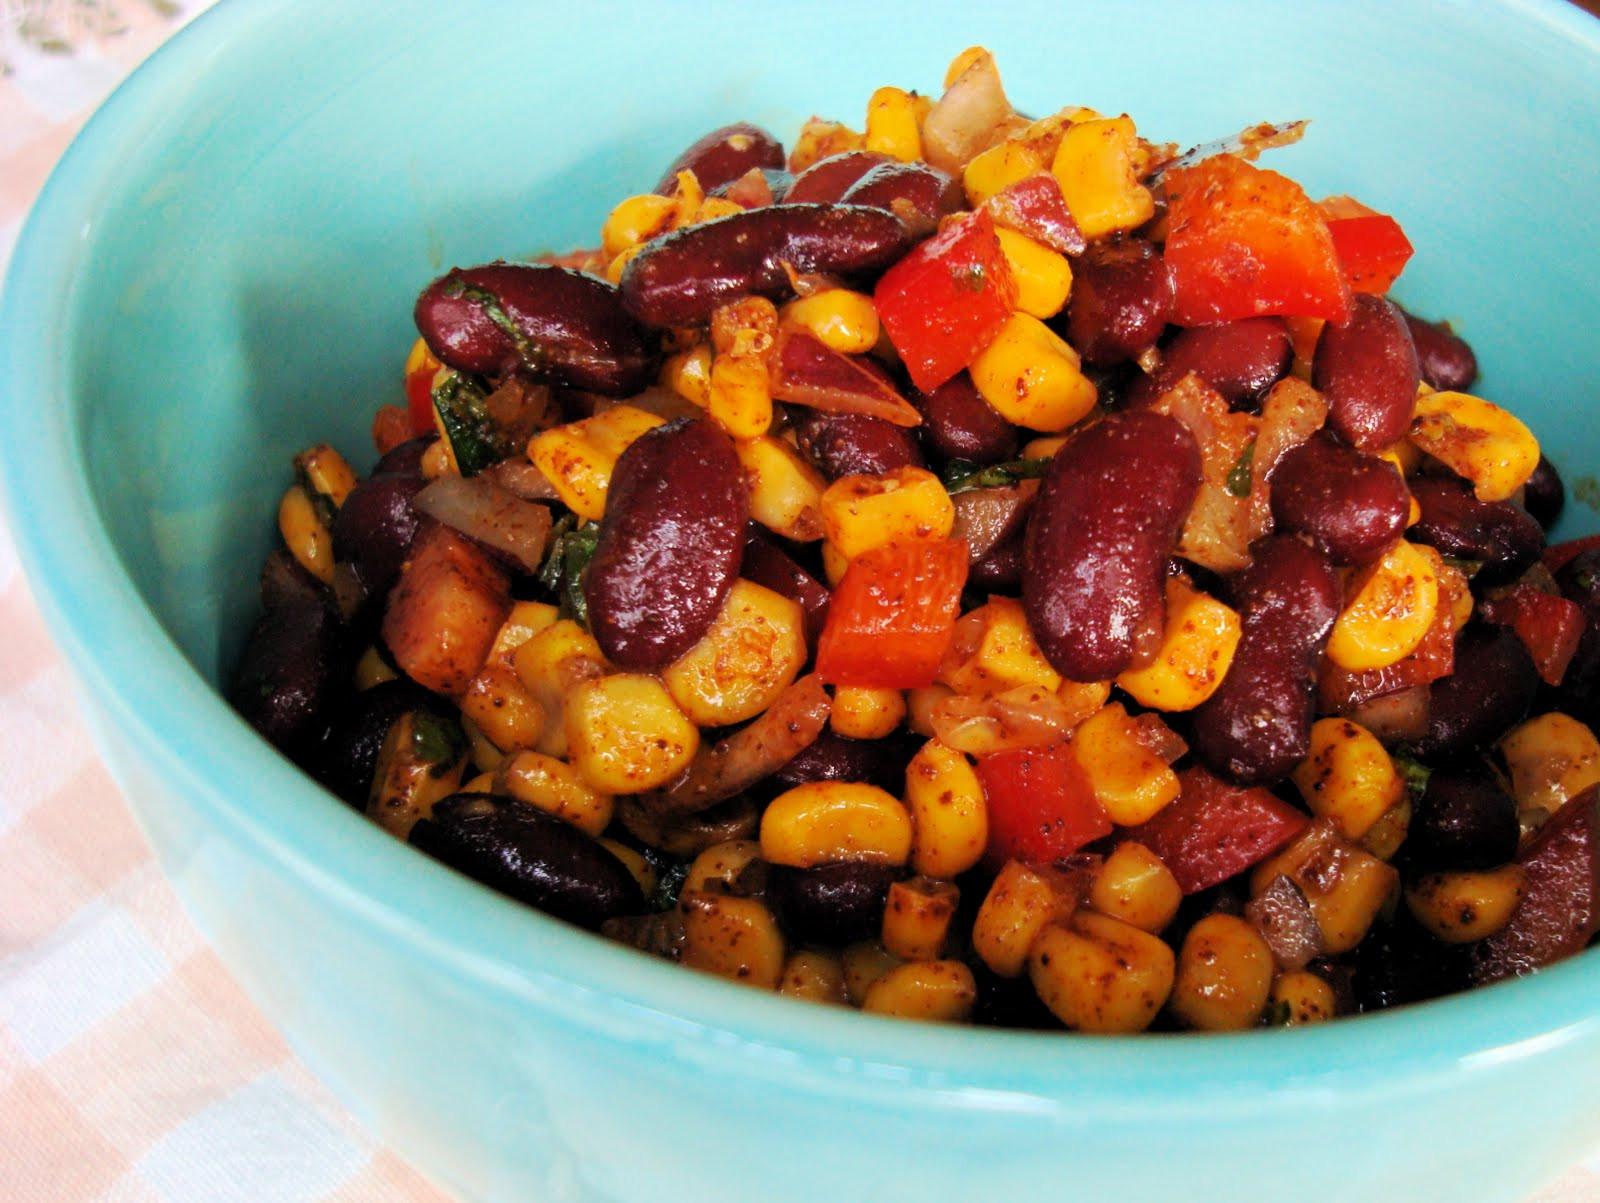 Healthy Kidney Bean Recipes  Kidney Beans Healthy Recipes With Kidney Beans